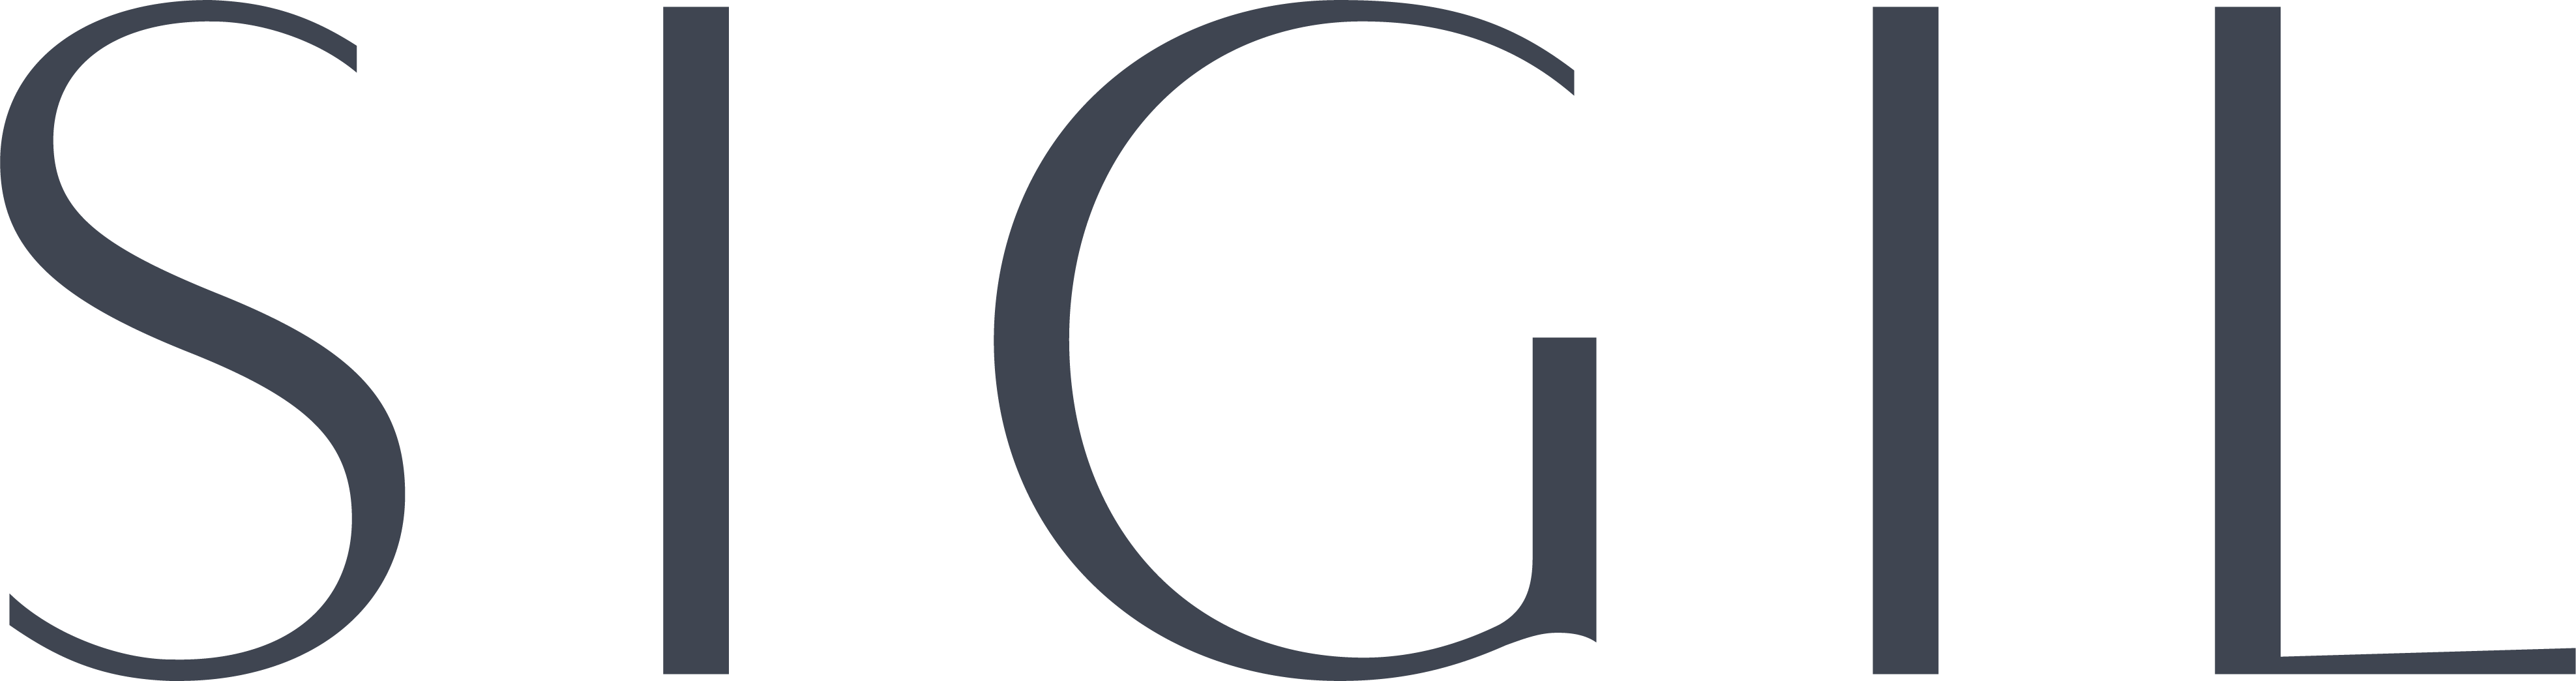 sigil-logo.png